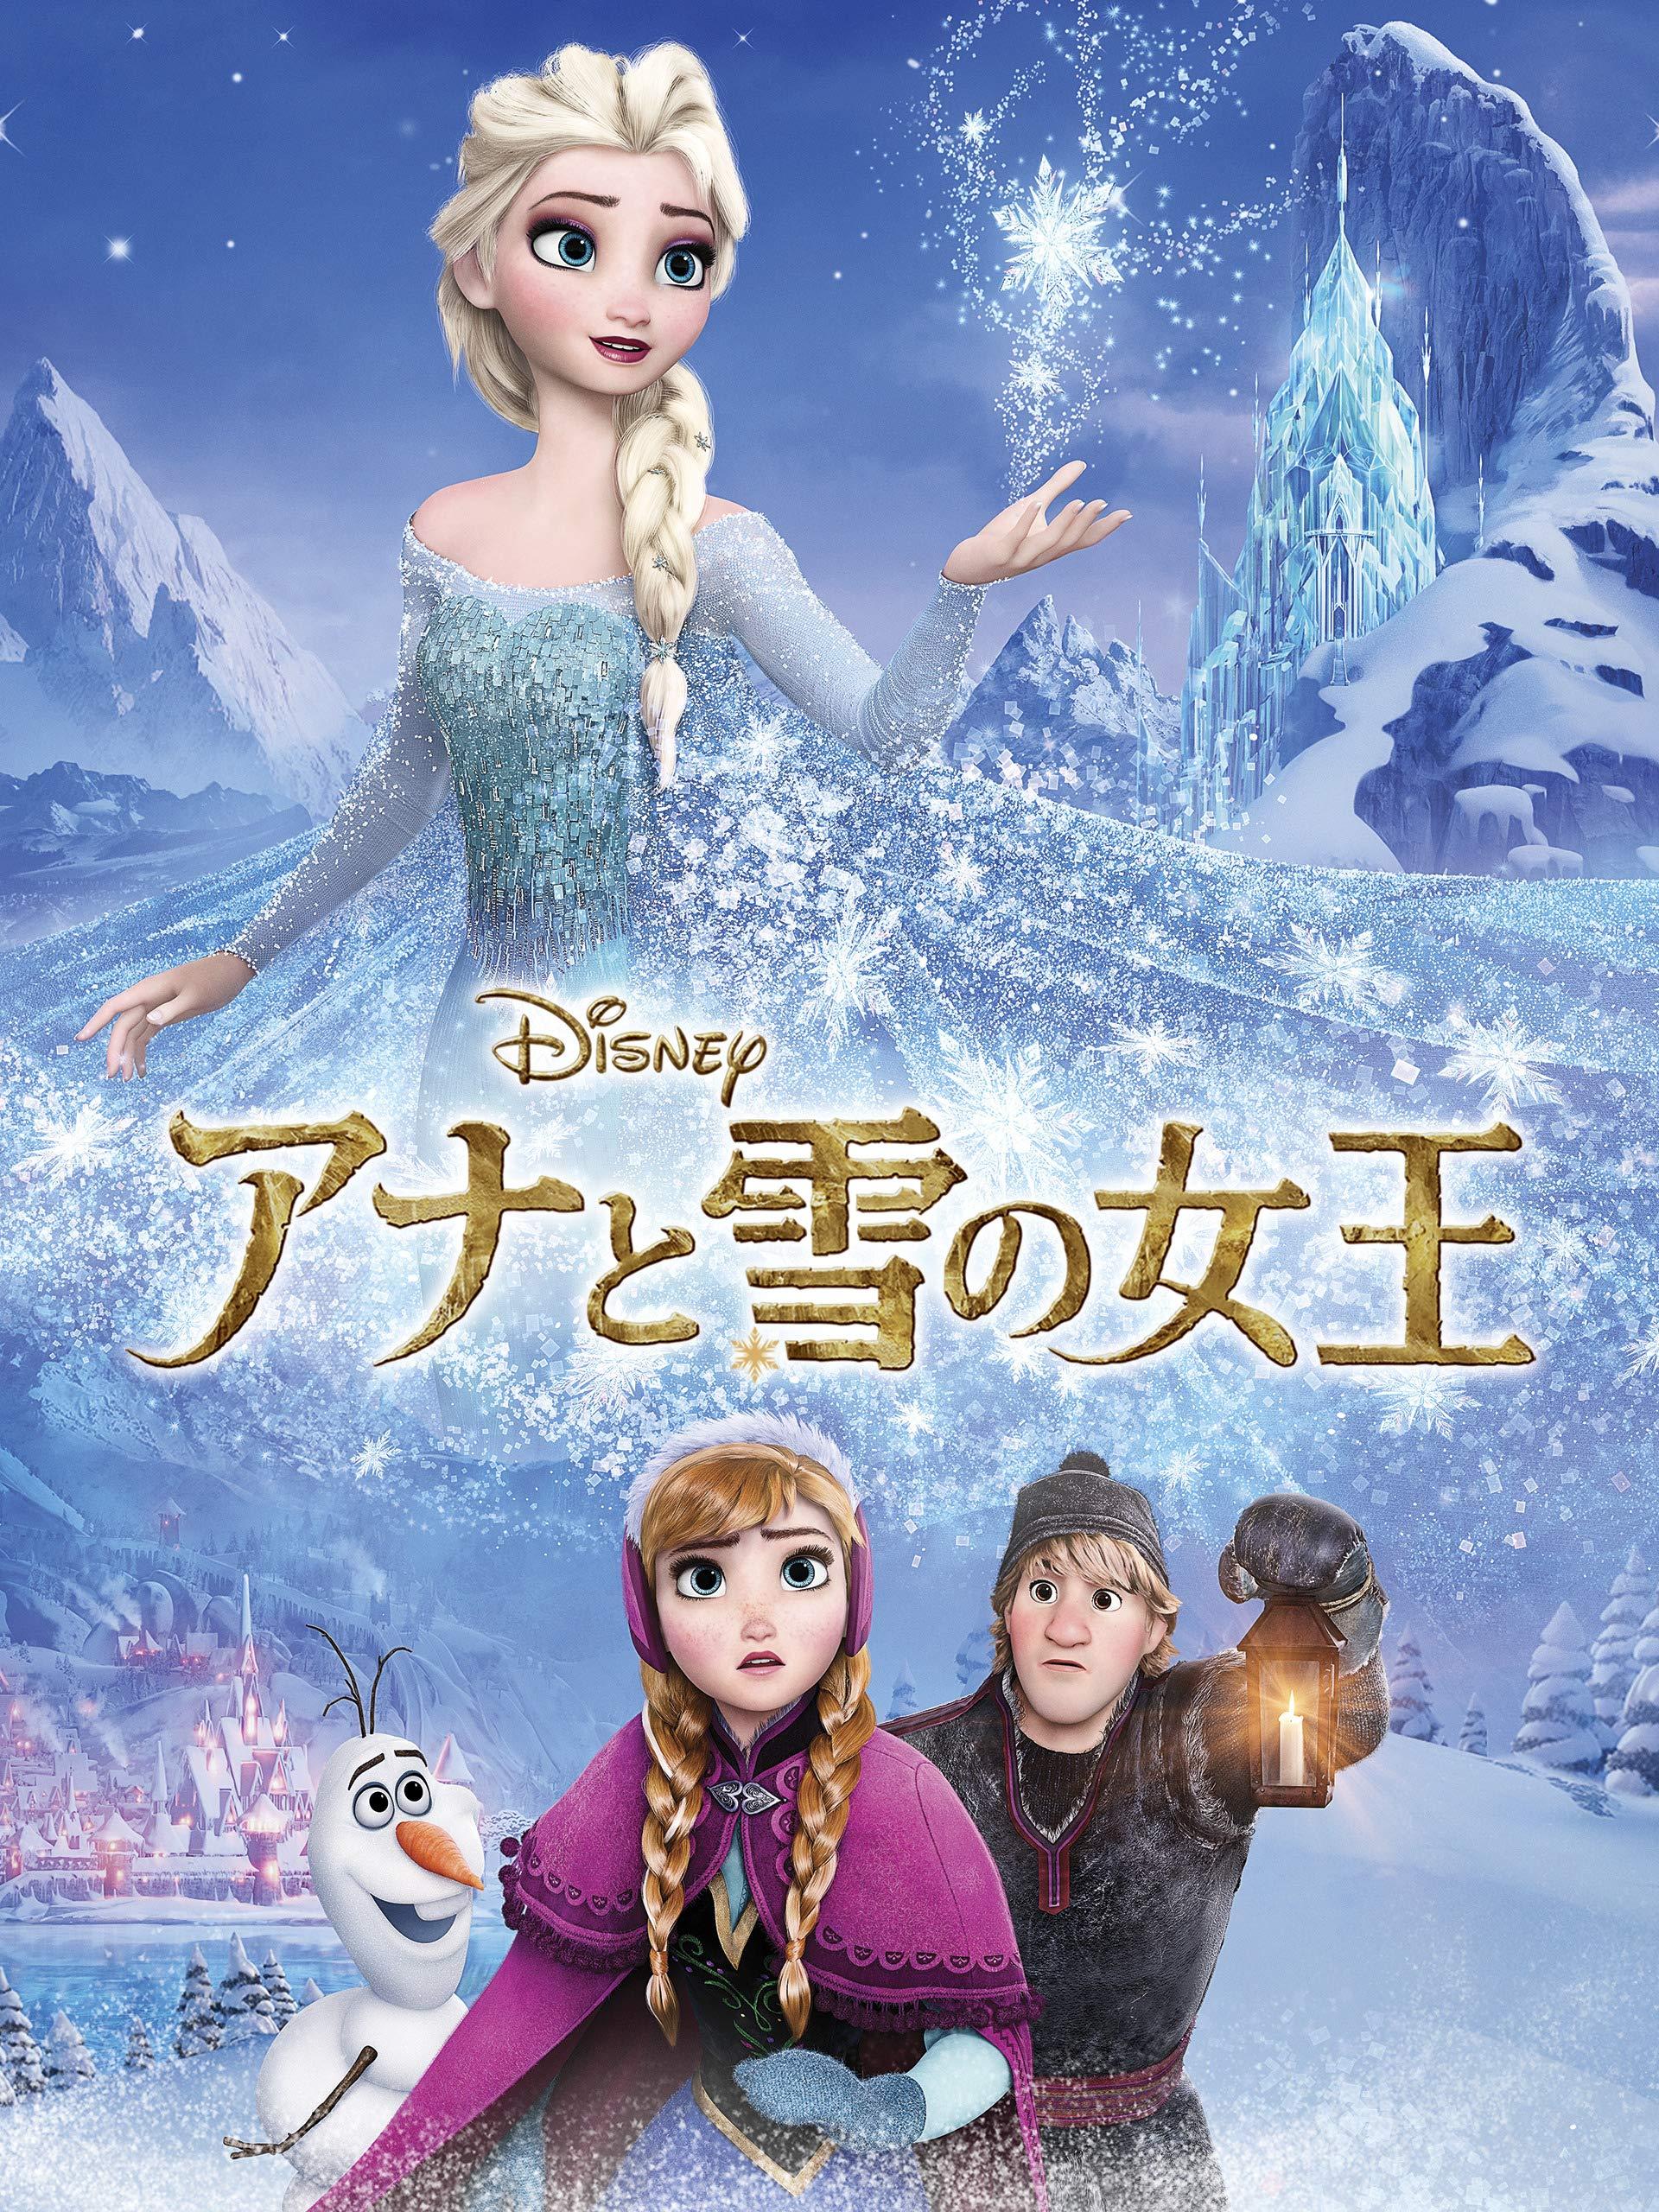 Amazon Co Jp アナと雪の女王 吹替版 を観る Prime Video